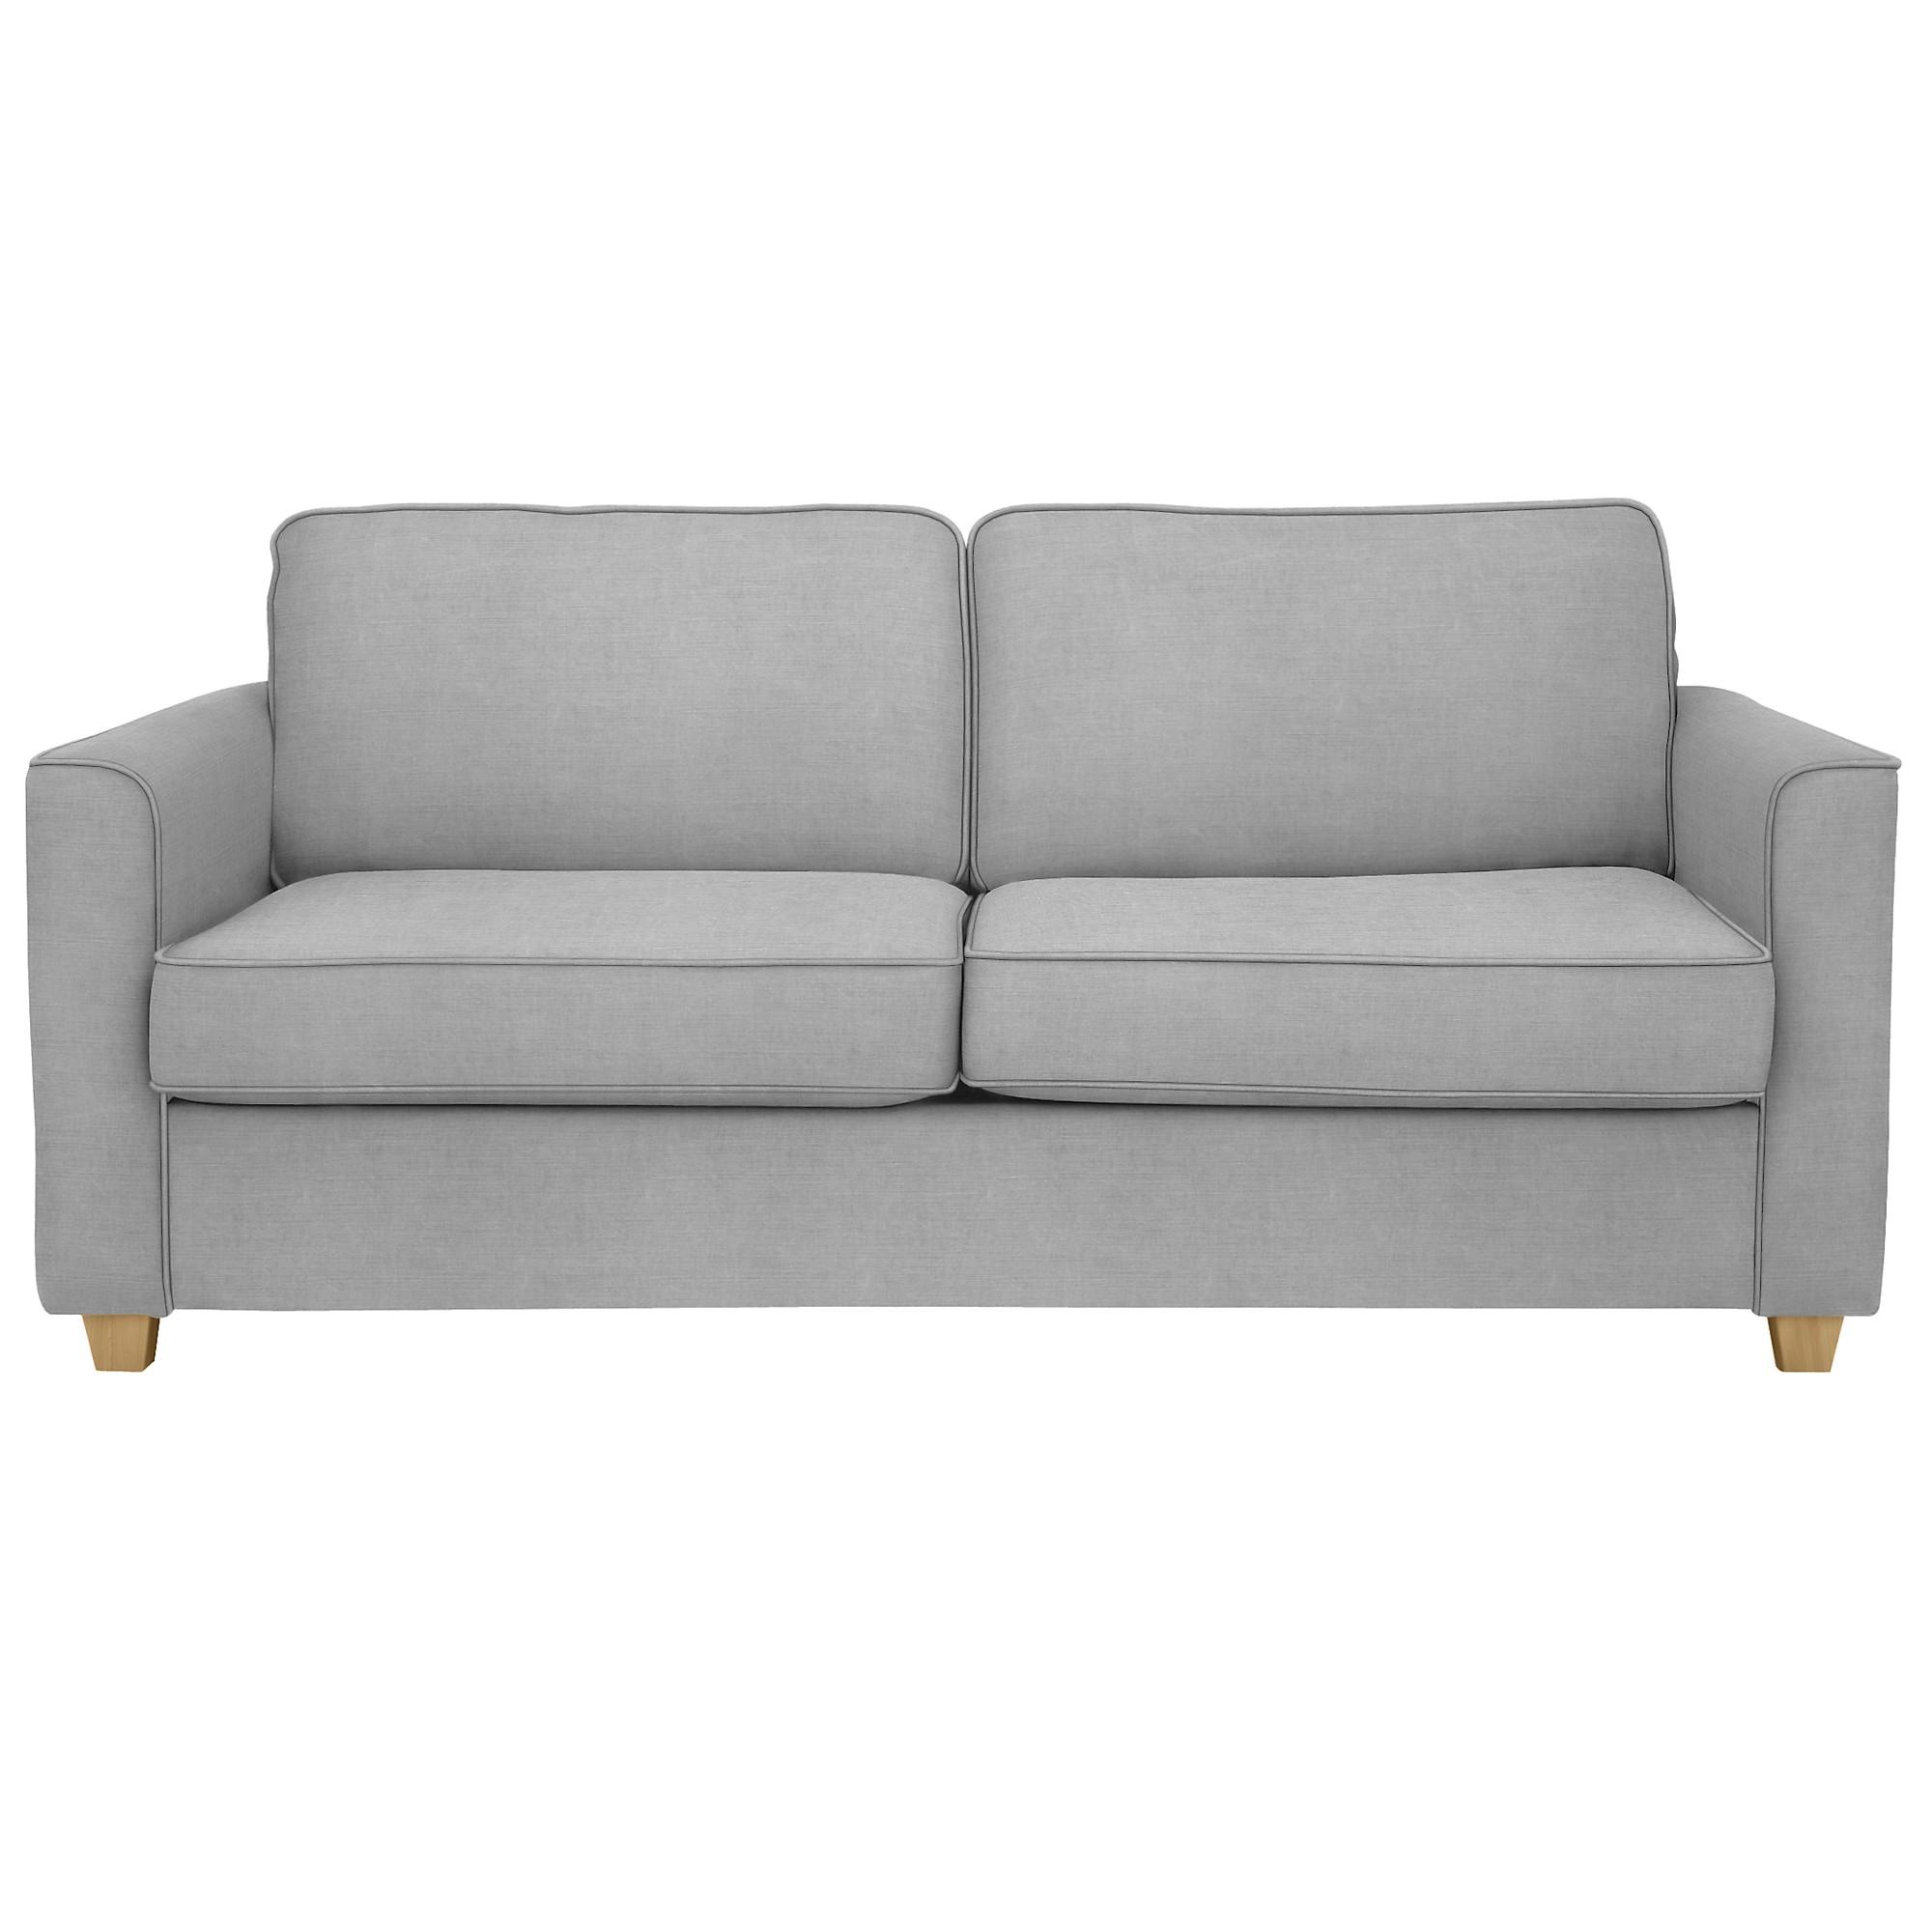 John Lewis Portia Medium Sofa